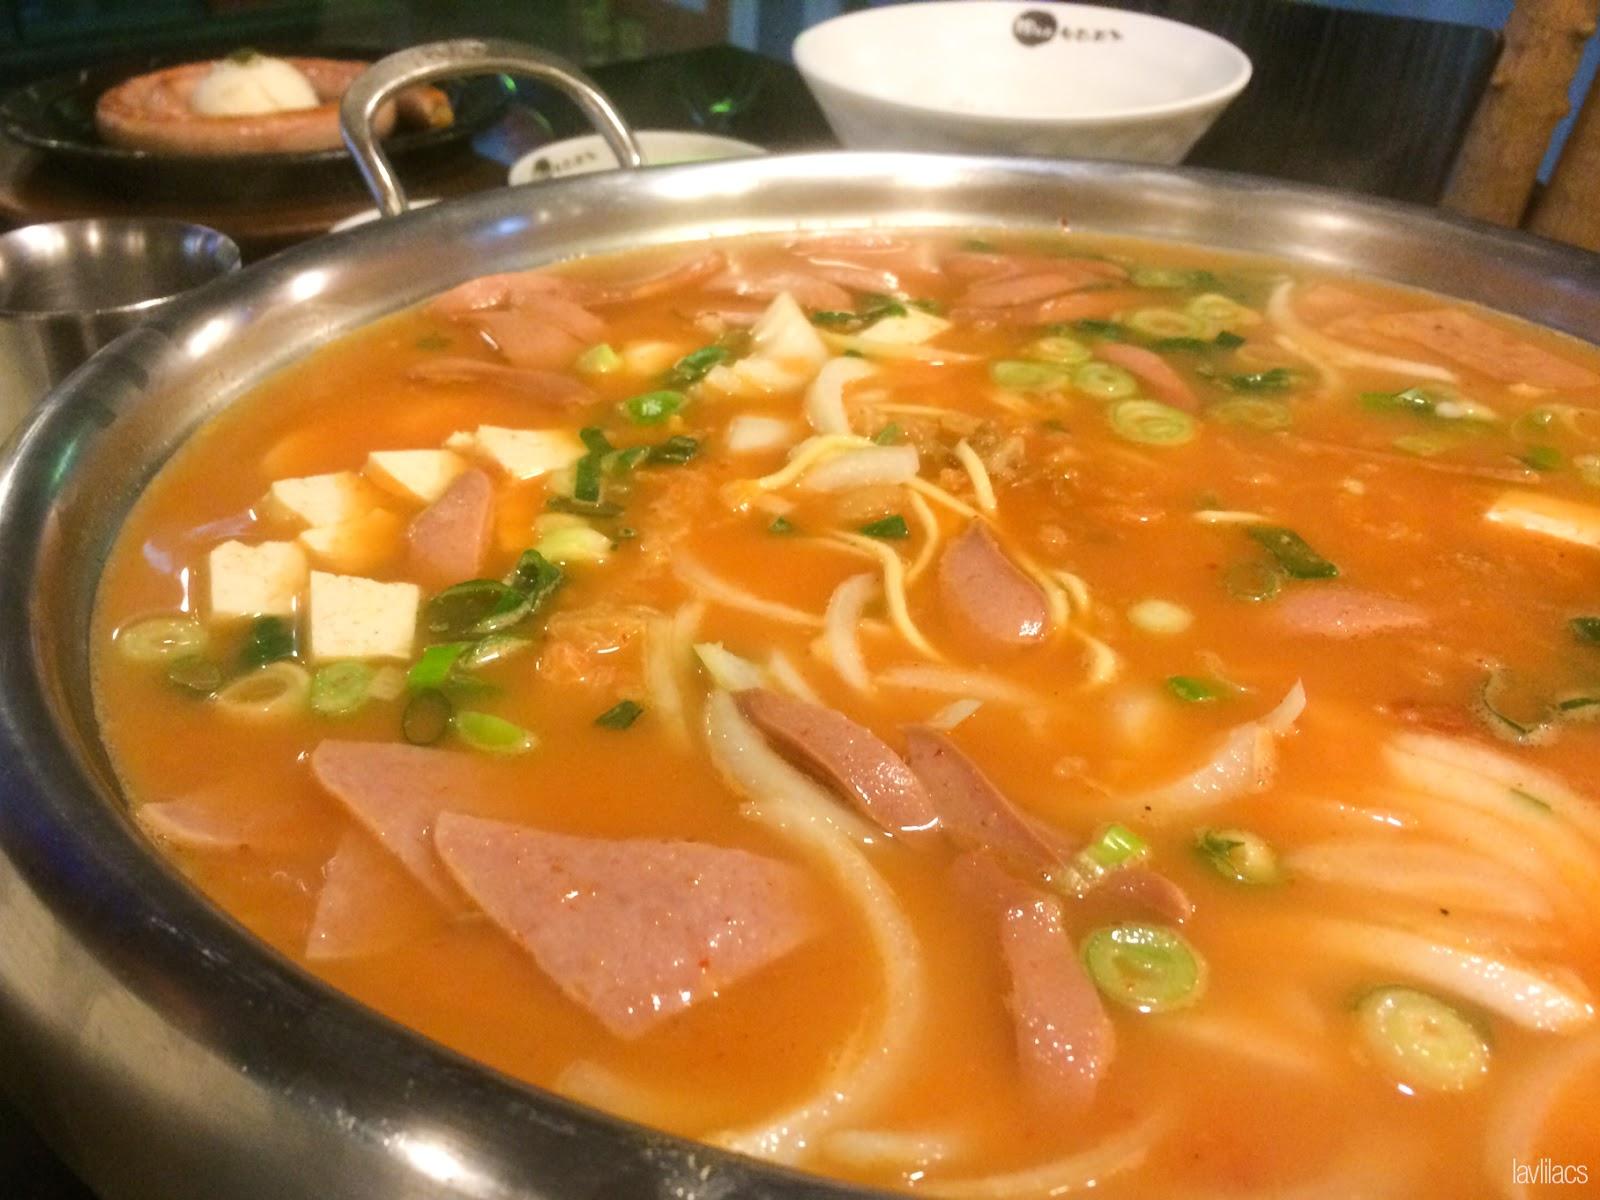 Sinchon, Seoul, Korea - Summer Study Abroad 2014 - Seoul City Touring - 18번지 부대찌개